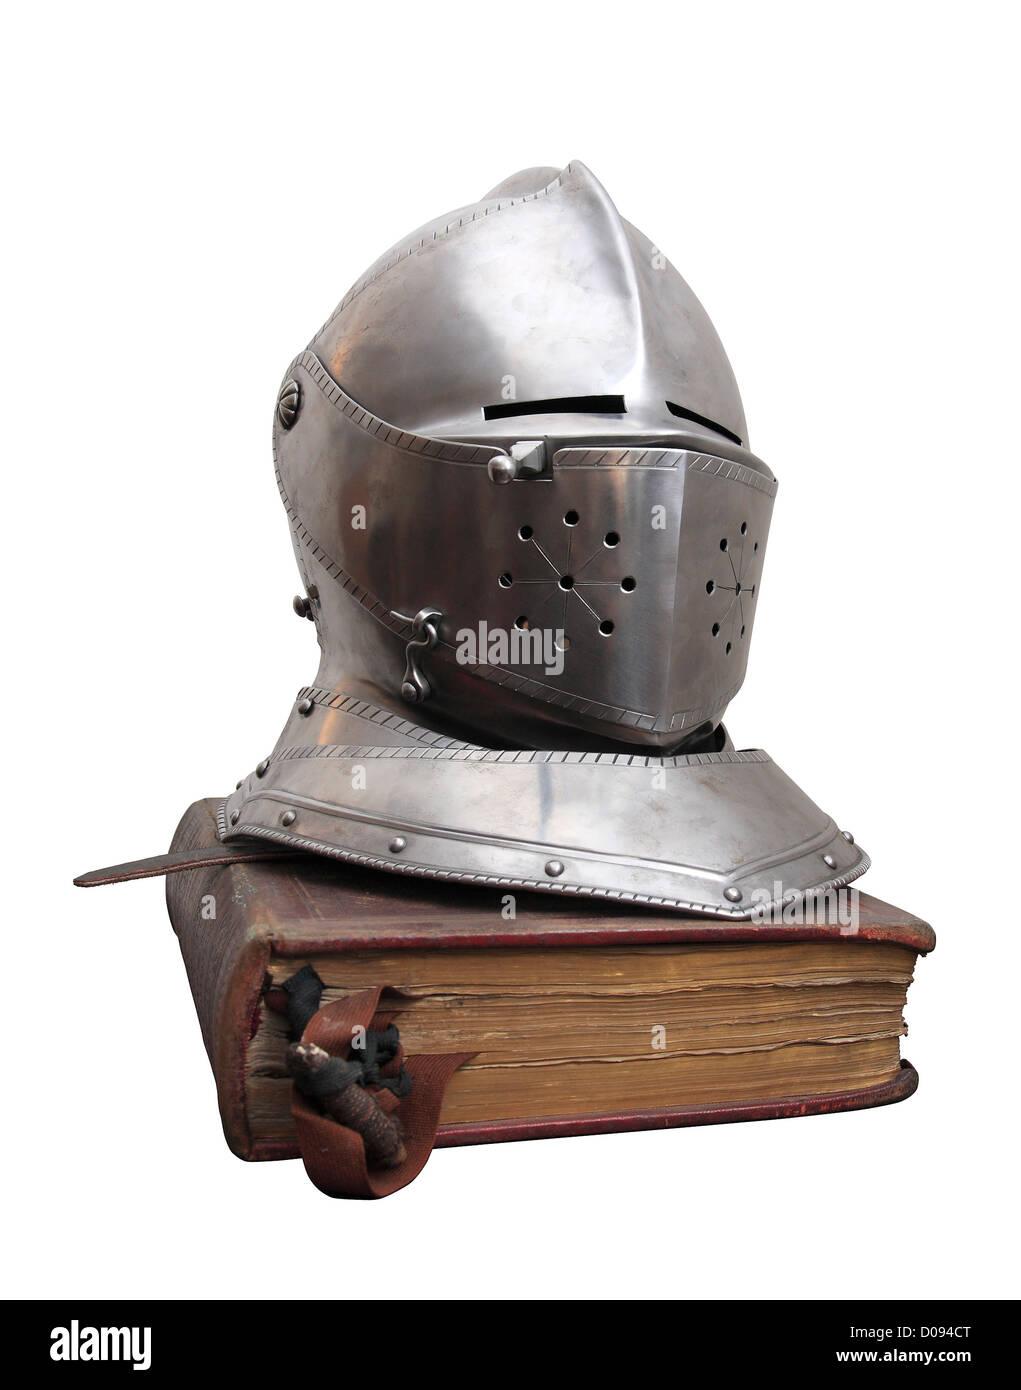 medieval helmet stock photos medieval helmet stock images alamy